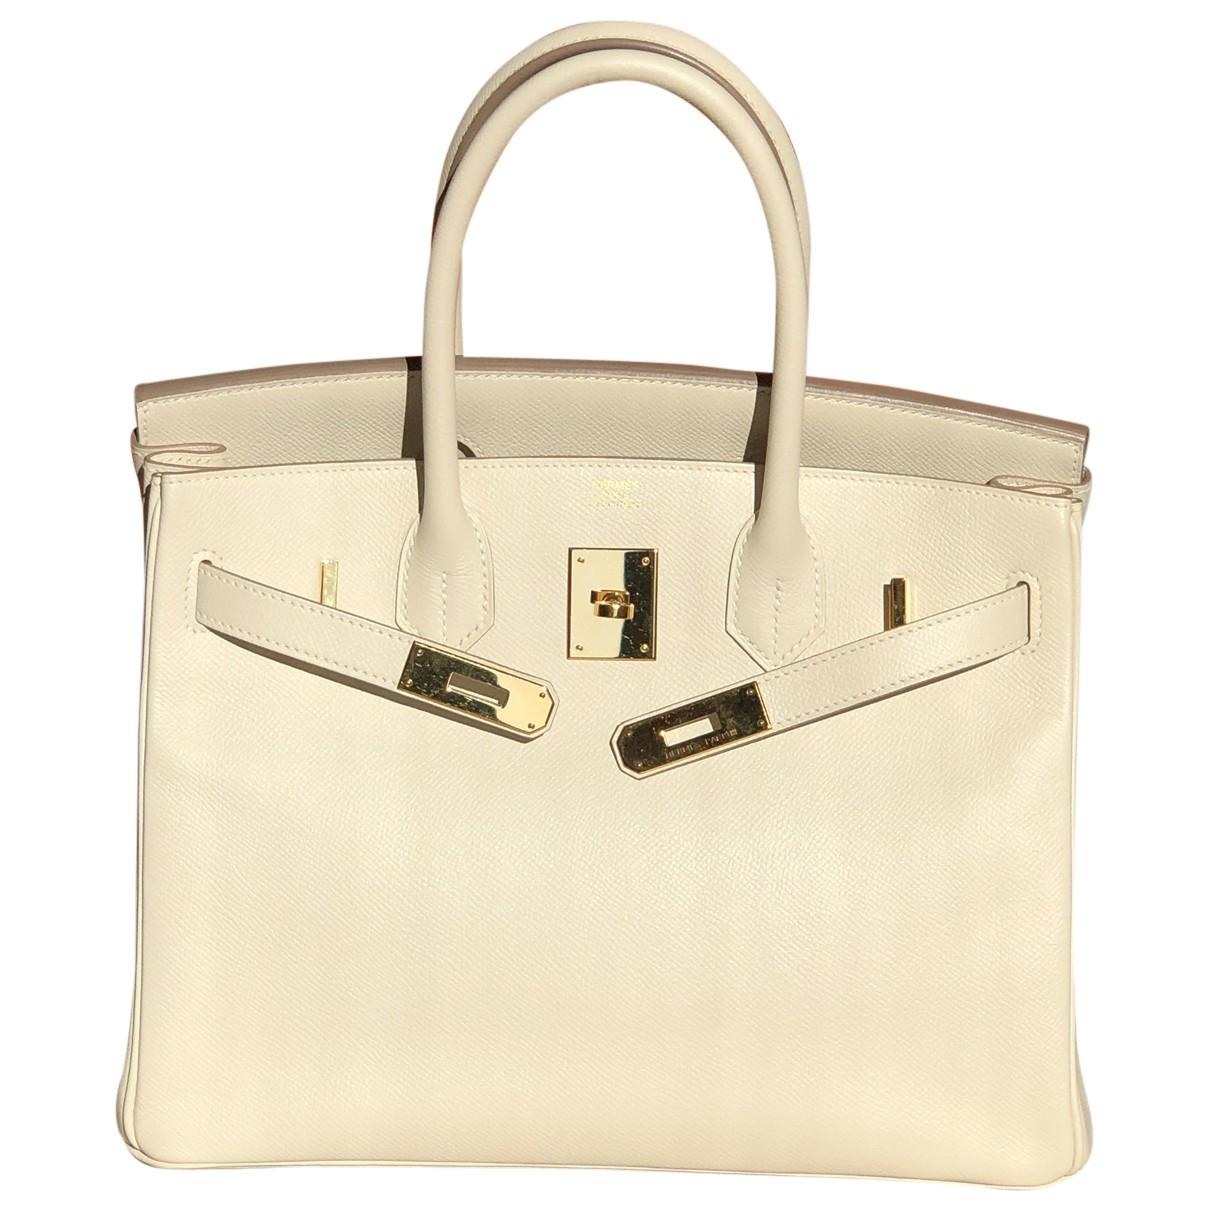 Hermès Birkin 30 White Leather handbag for Women N